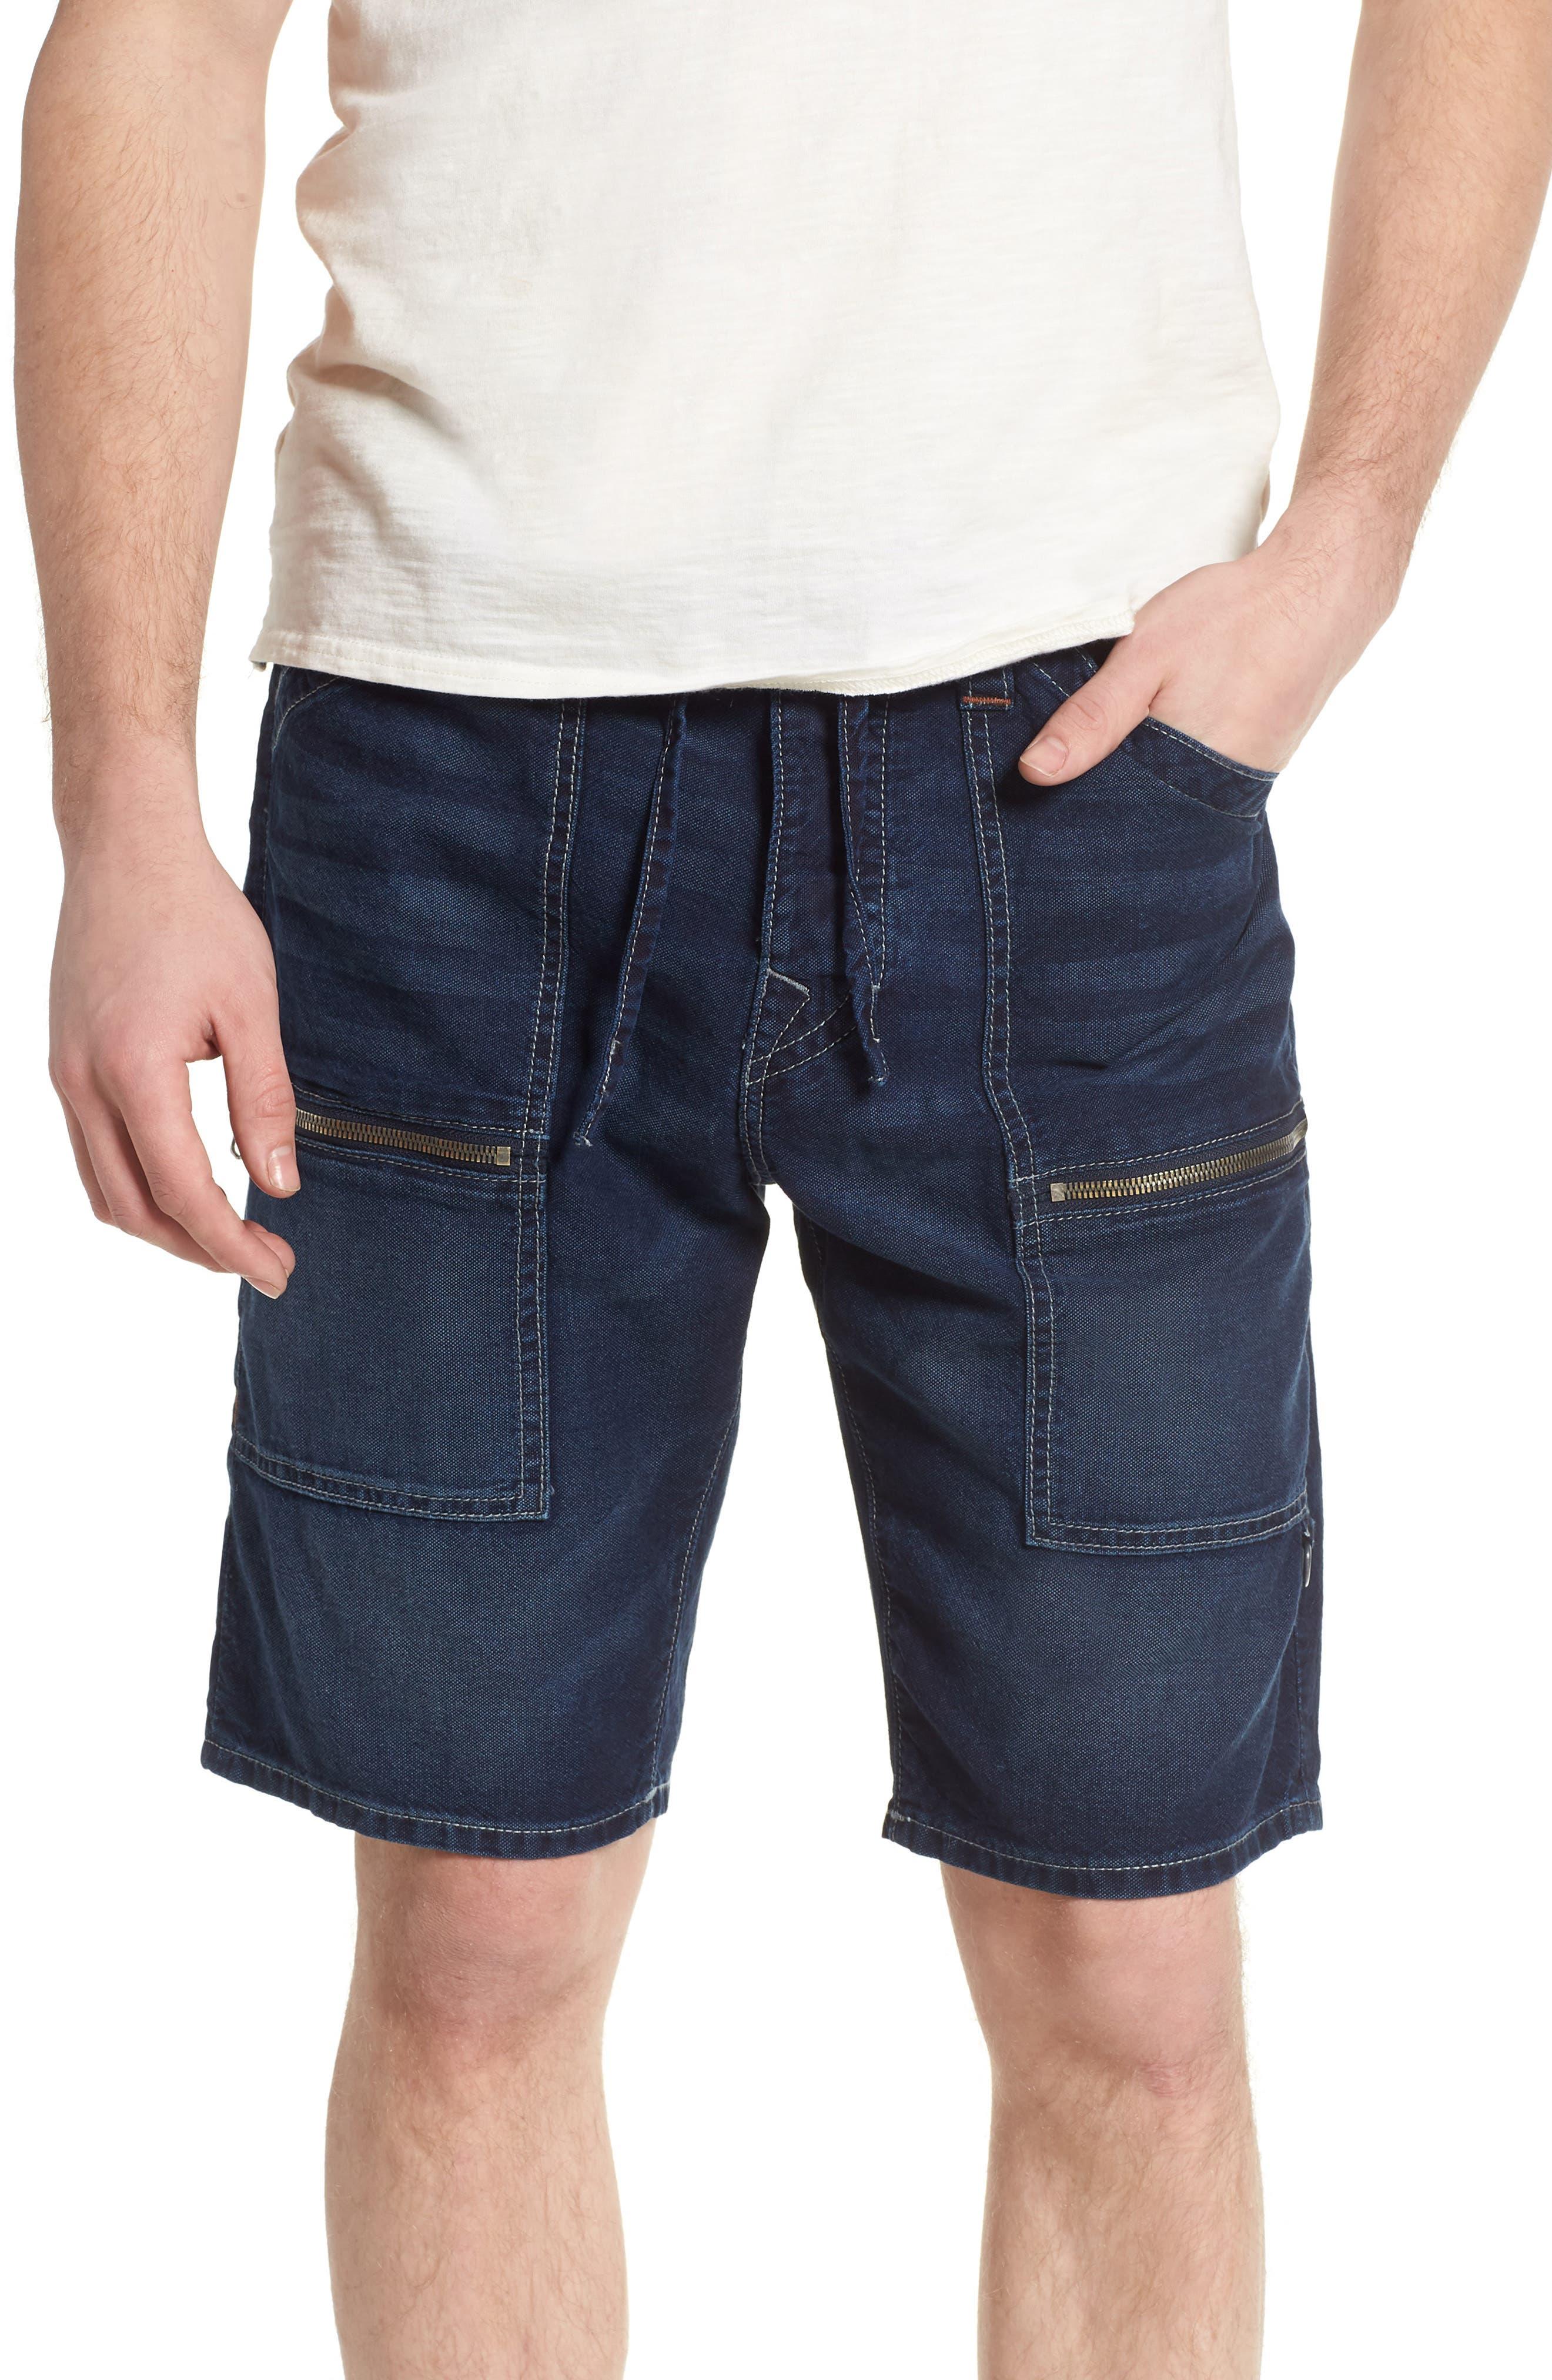 Trail Utility Shorts,                         Main,                         color, Eqdd Union Special